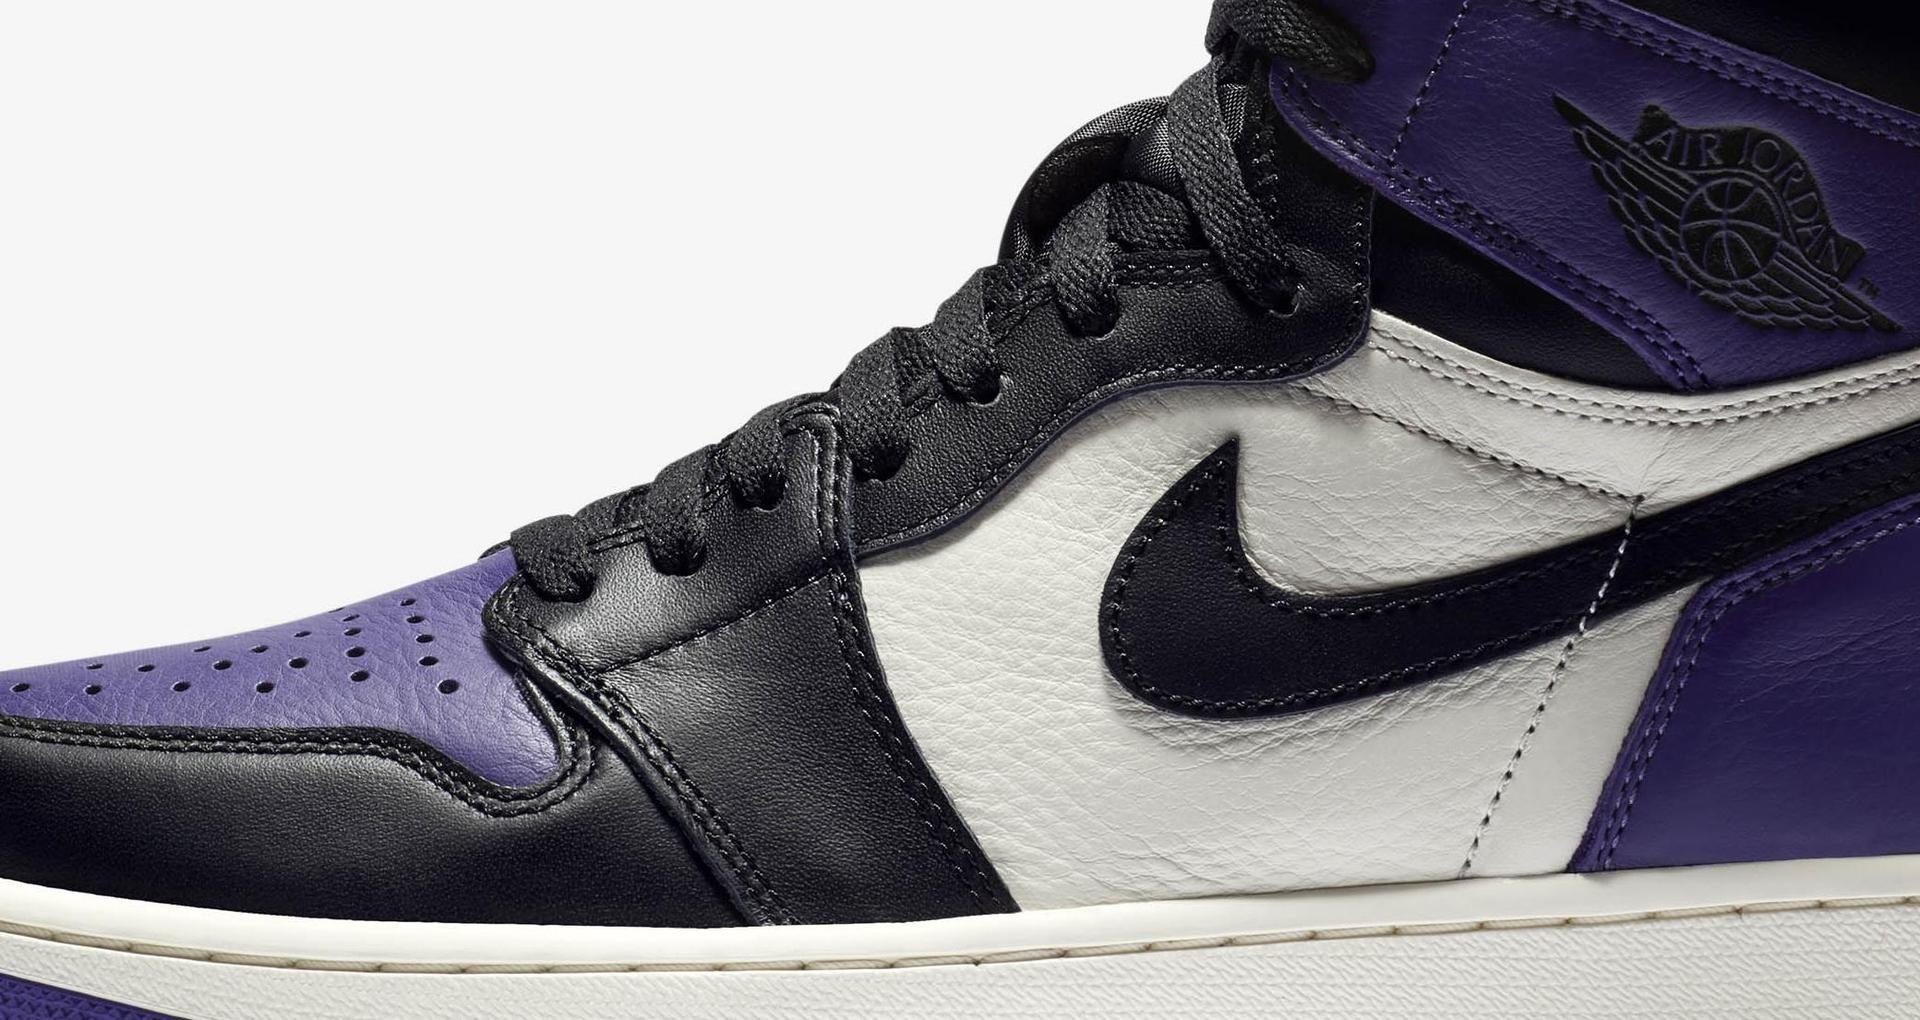 meet 53449 6cf7e Air Jordan 1 Retro 'Court Purple' Release Date. Nike+ SNKRS